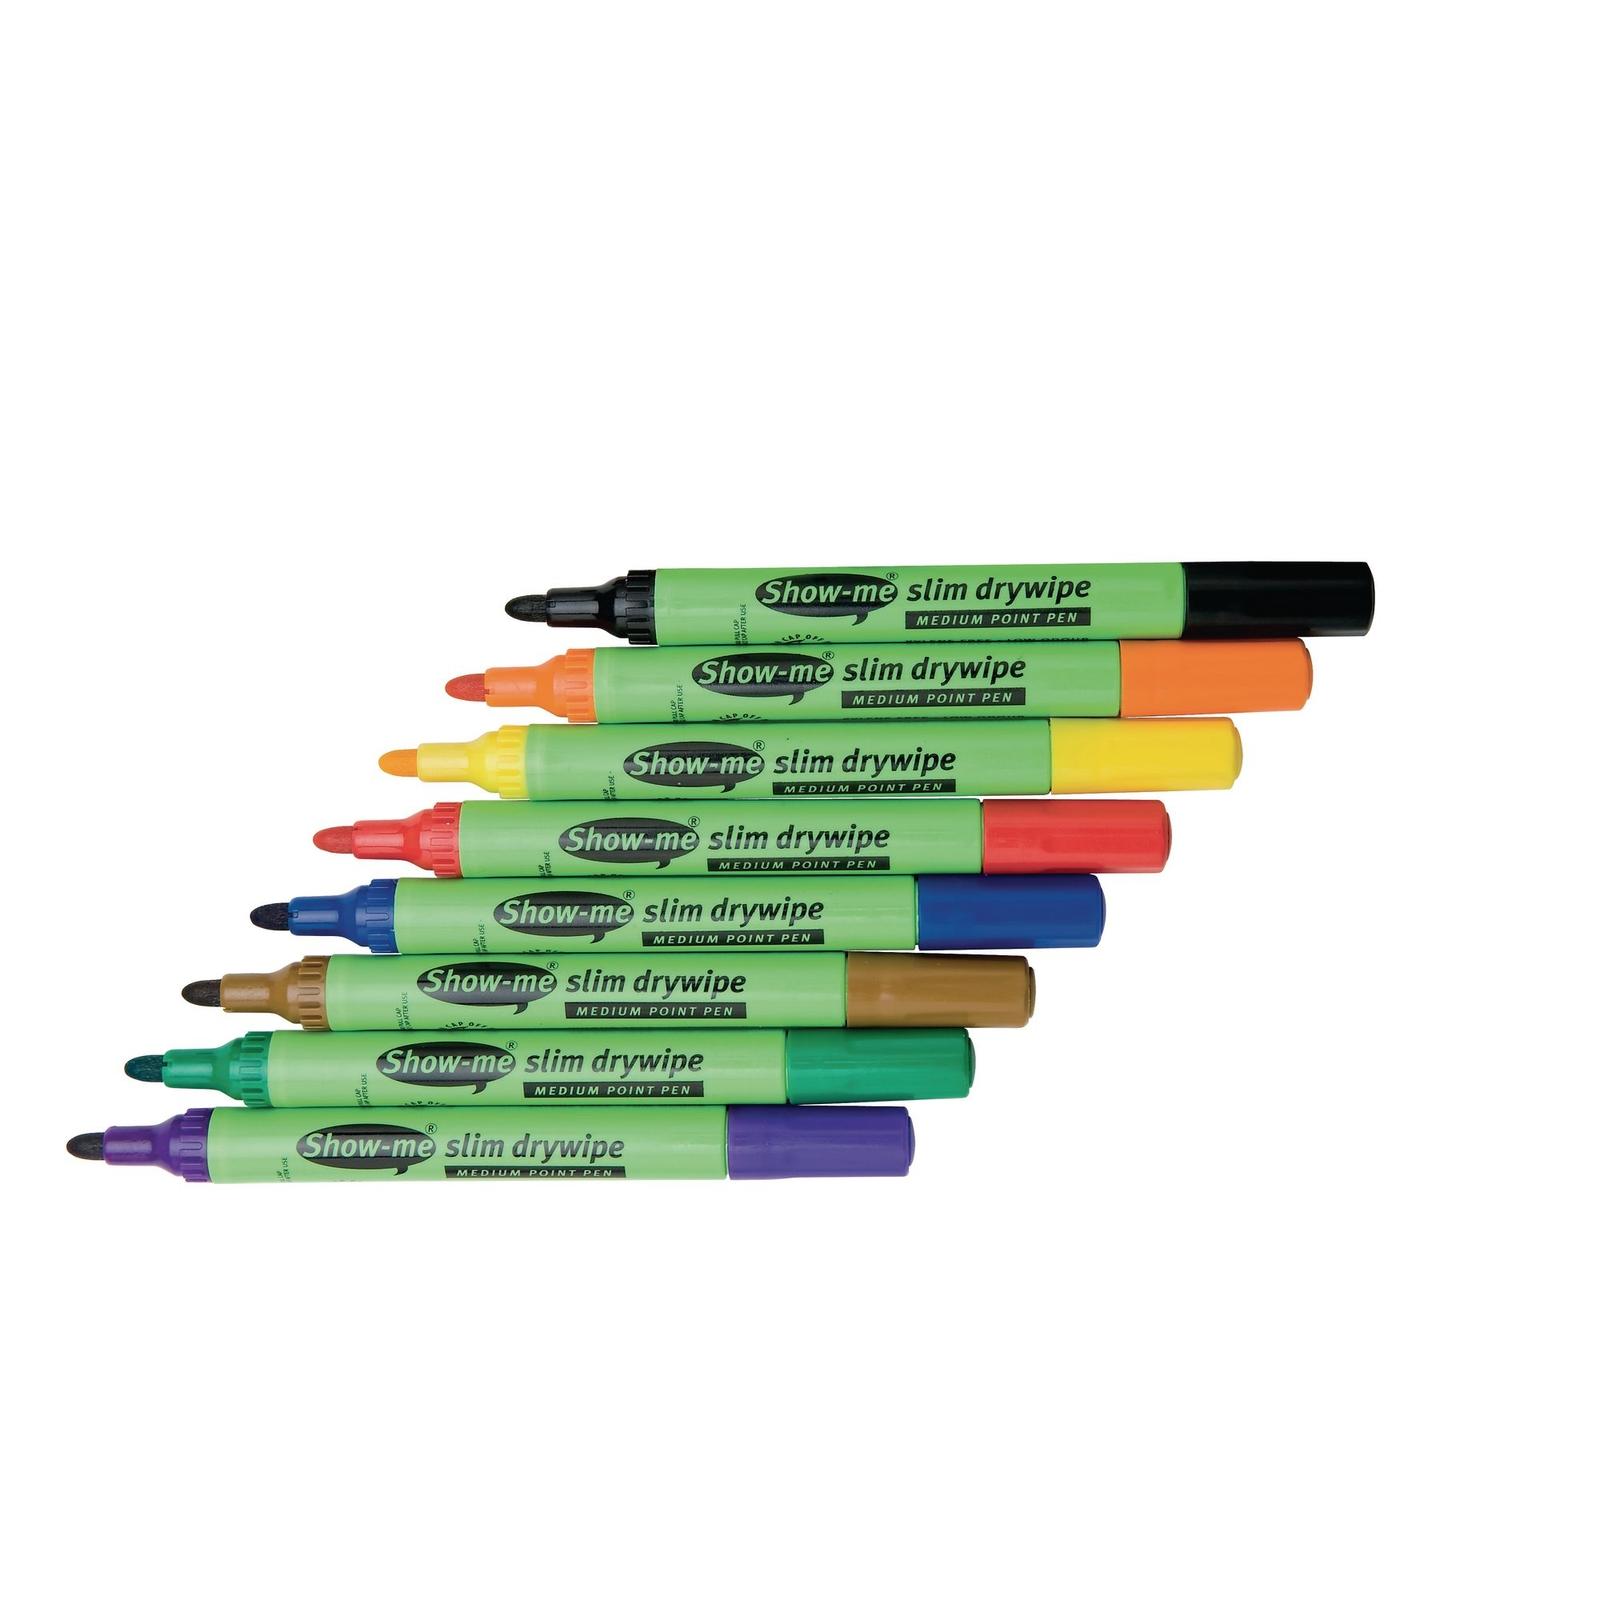 Show-me Whiteboard Marker Pens Assorted, Bullet Tip - Pack of 50